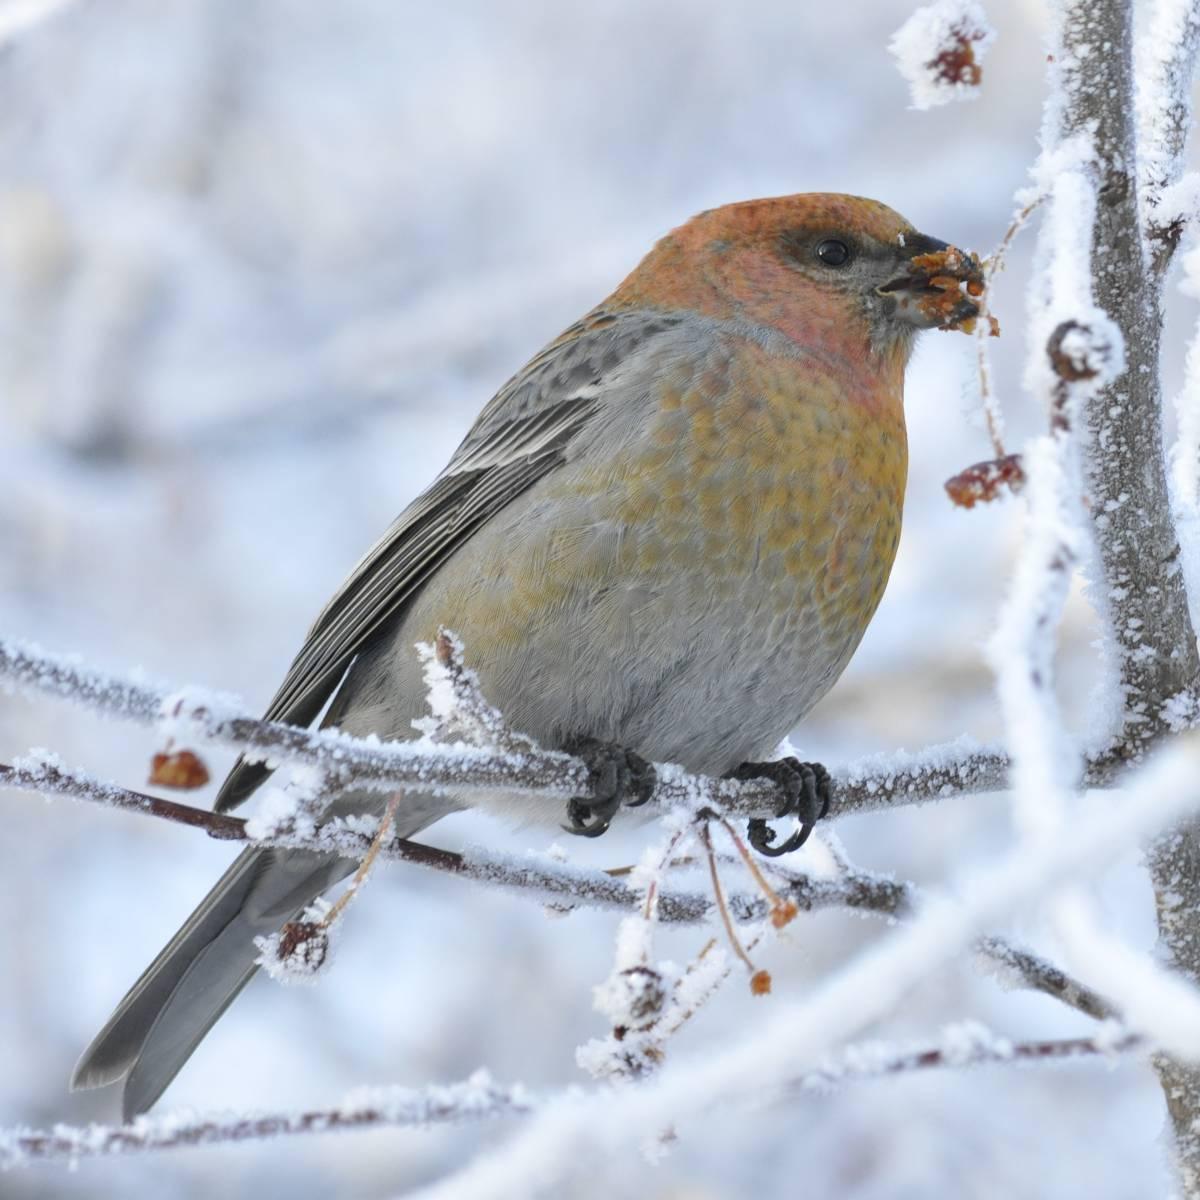 птицы сибири зимой фото с названиями пожара